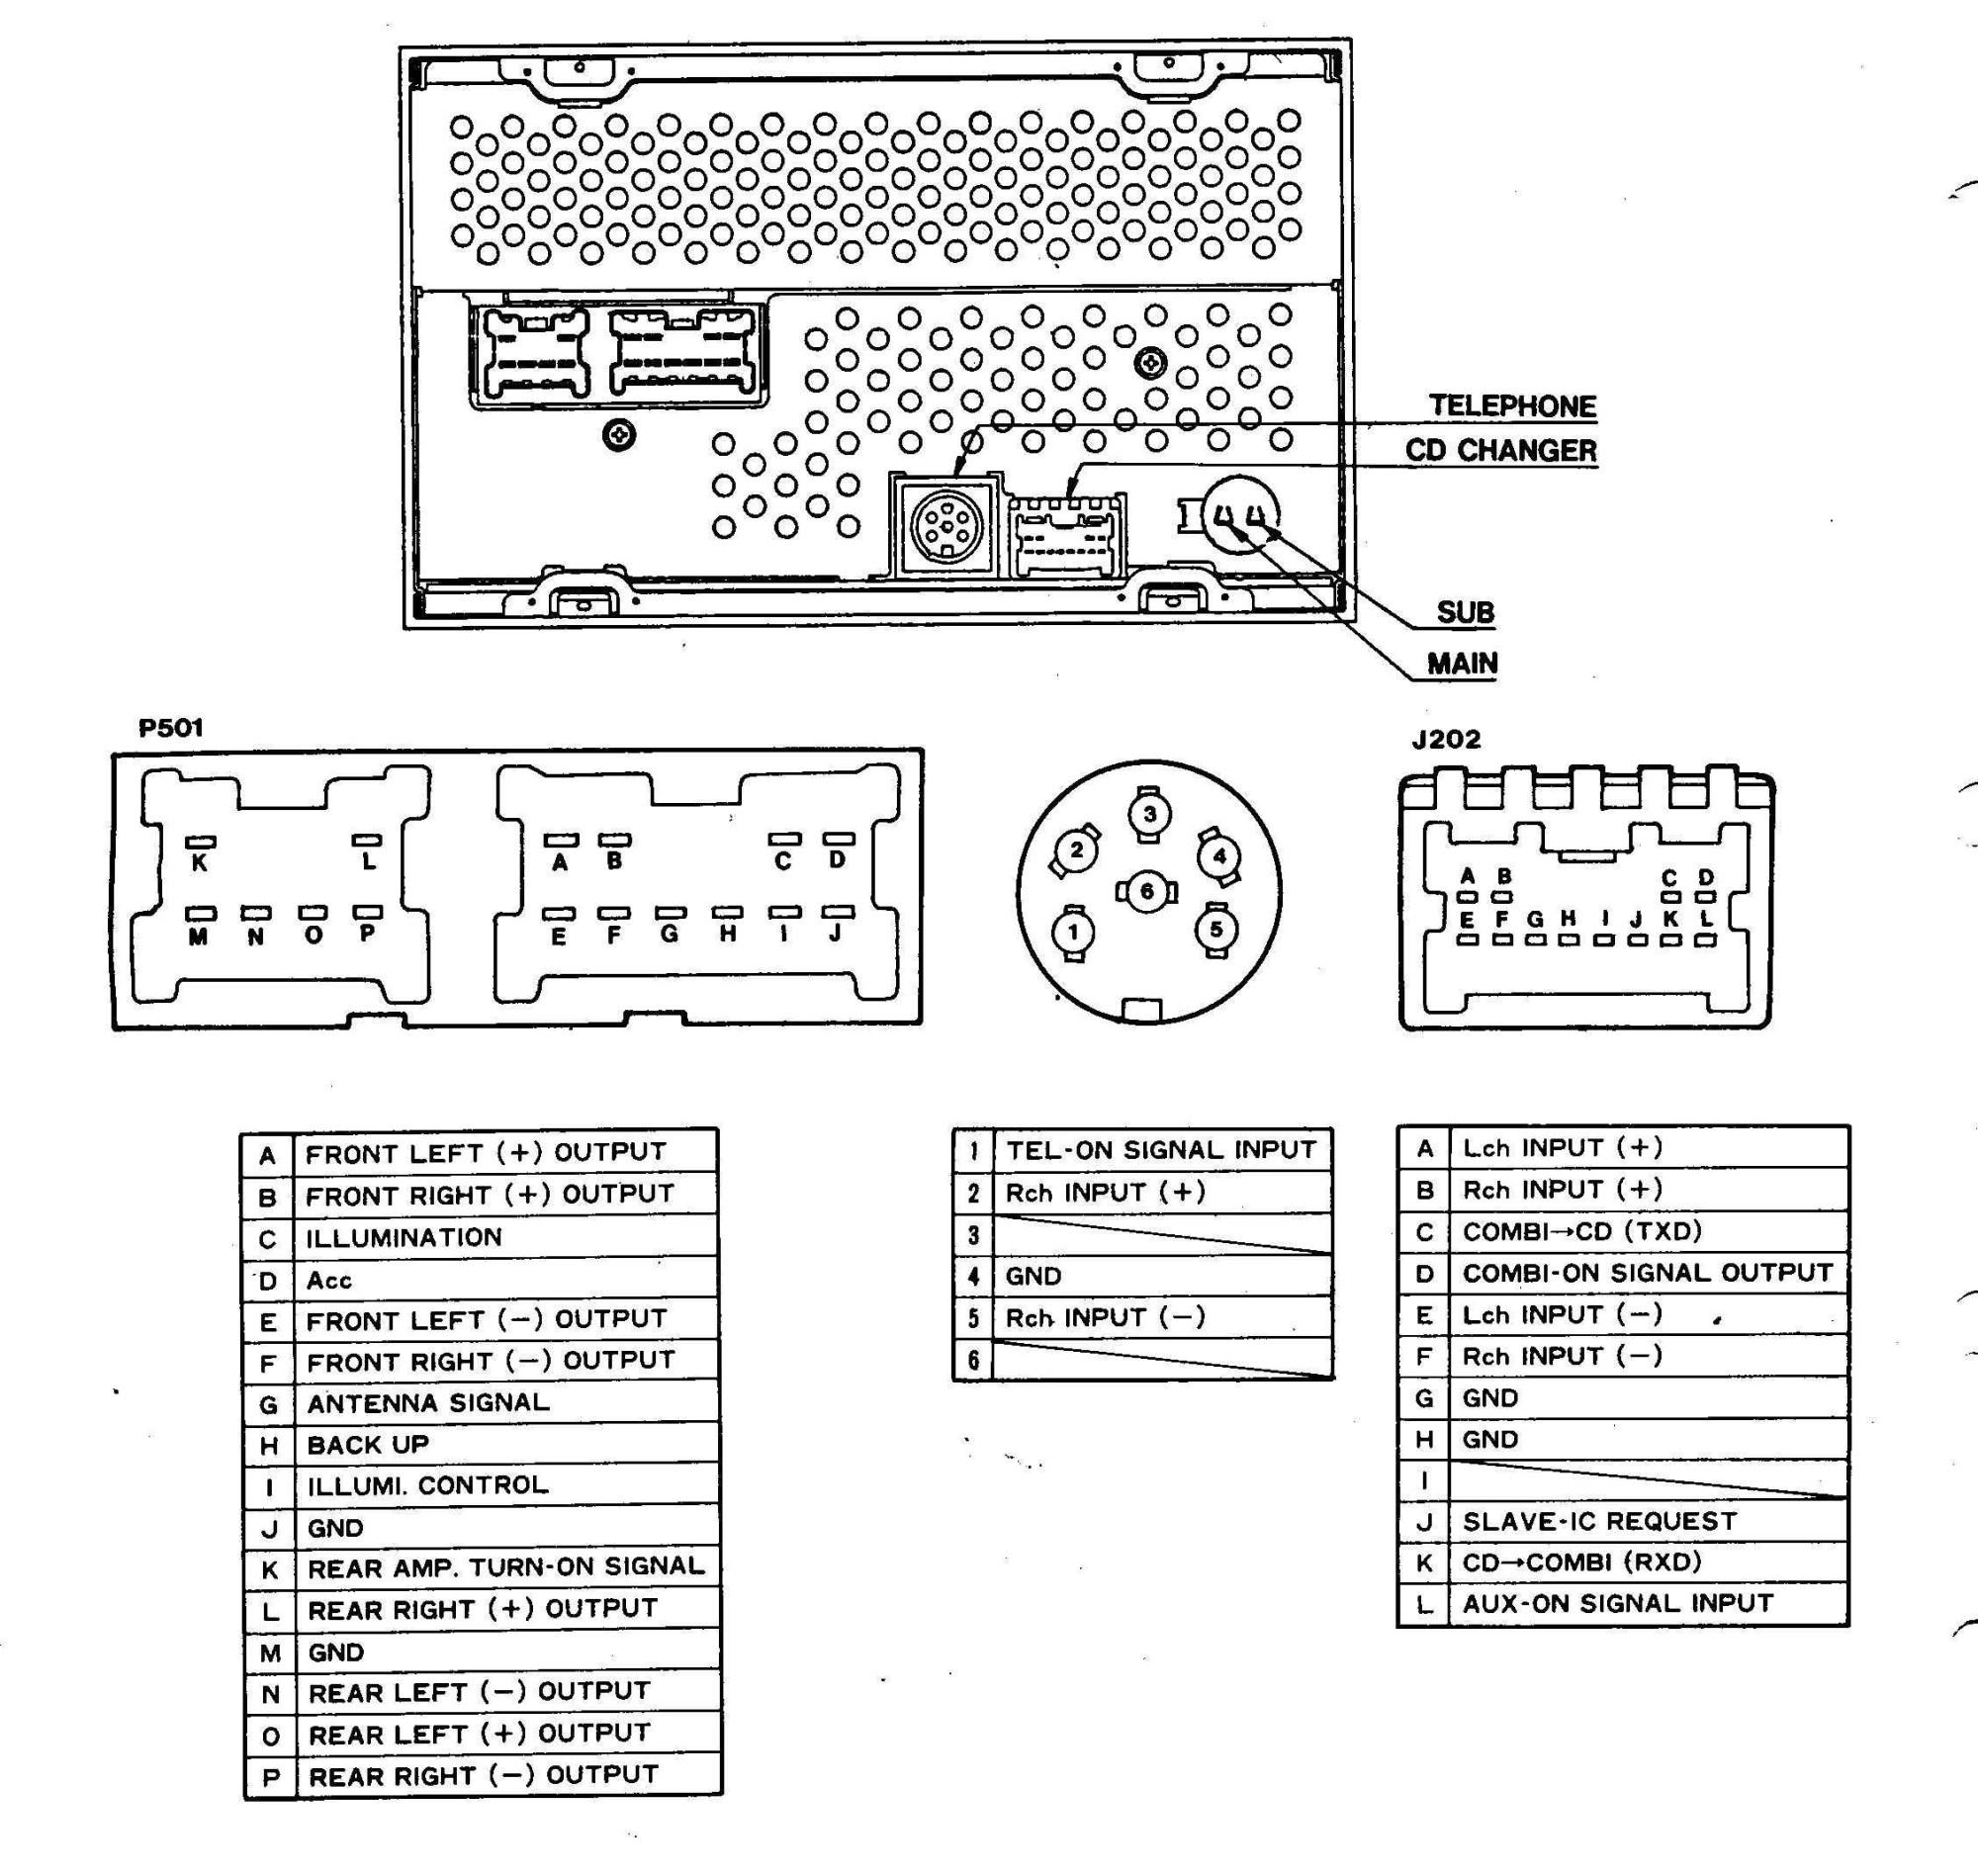 hight resolution of 1994 nissan sentra engine diagram nissan maxima wiring diagram manual wiring diagram of 1994 nissan sentra